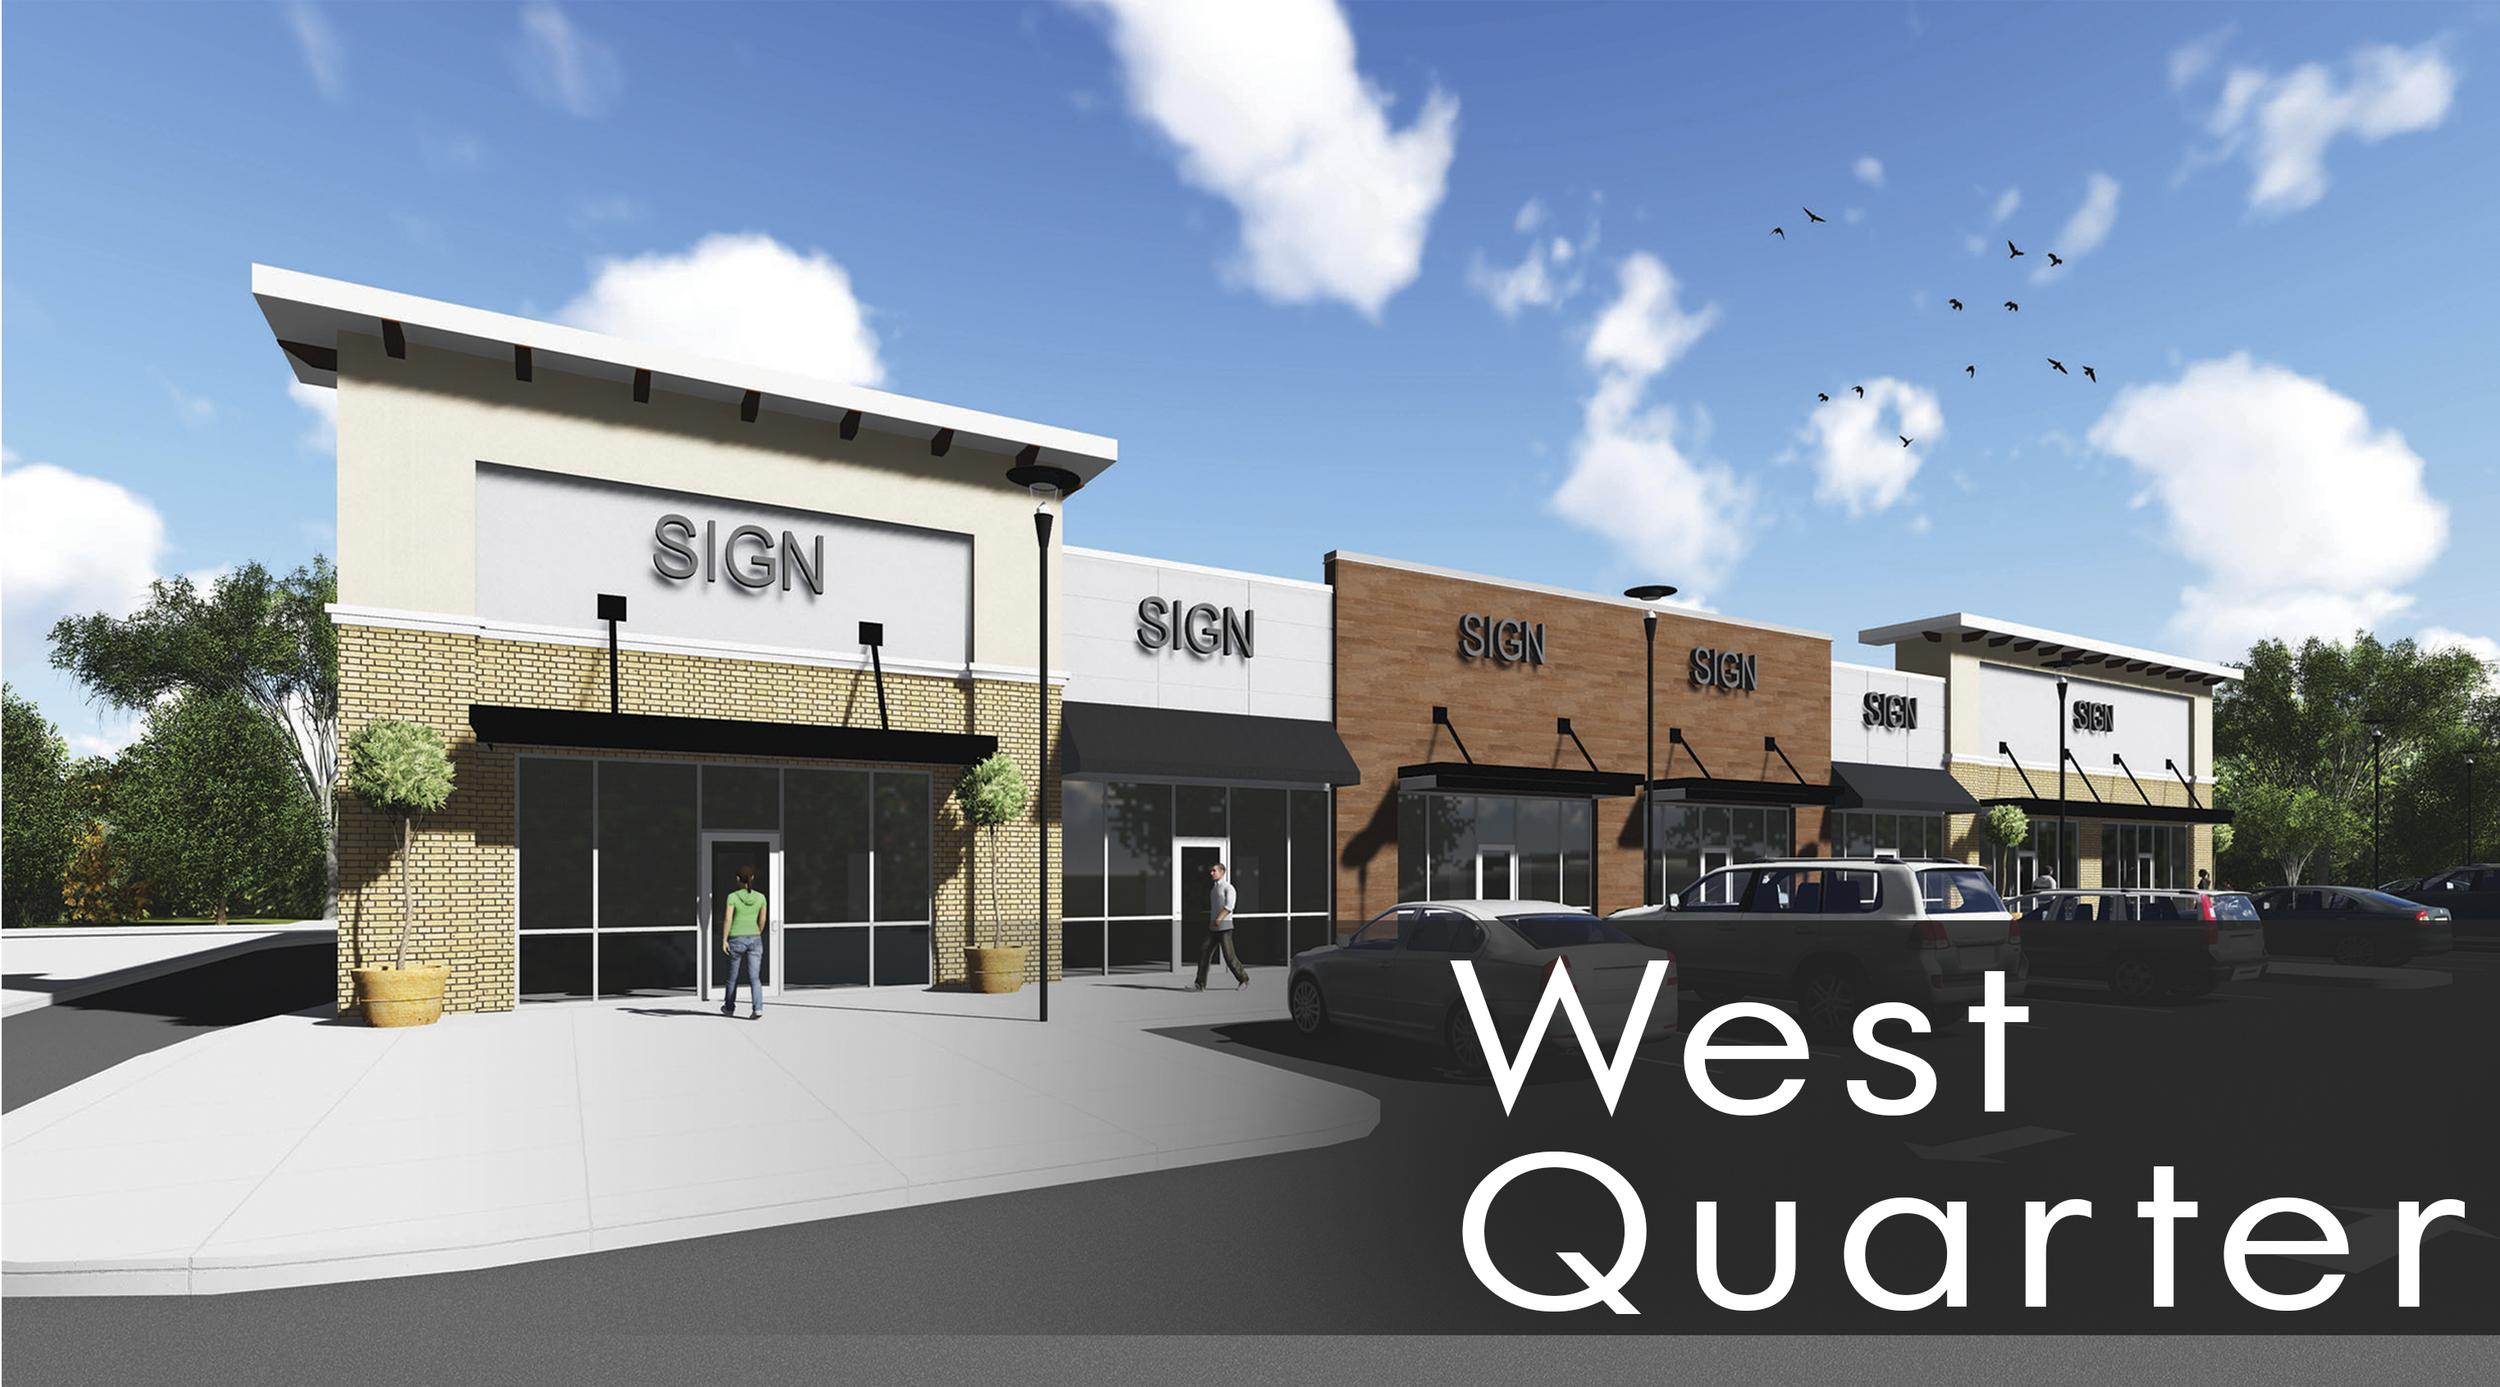 West Quarter - Winter Garden Land 7 Acres For Sale & For Lease